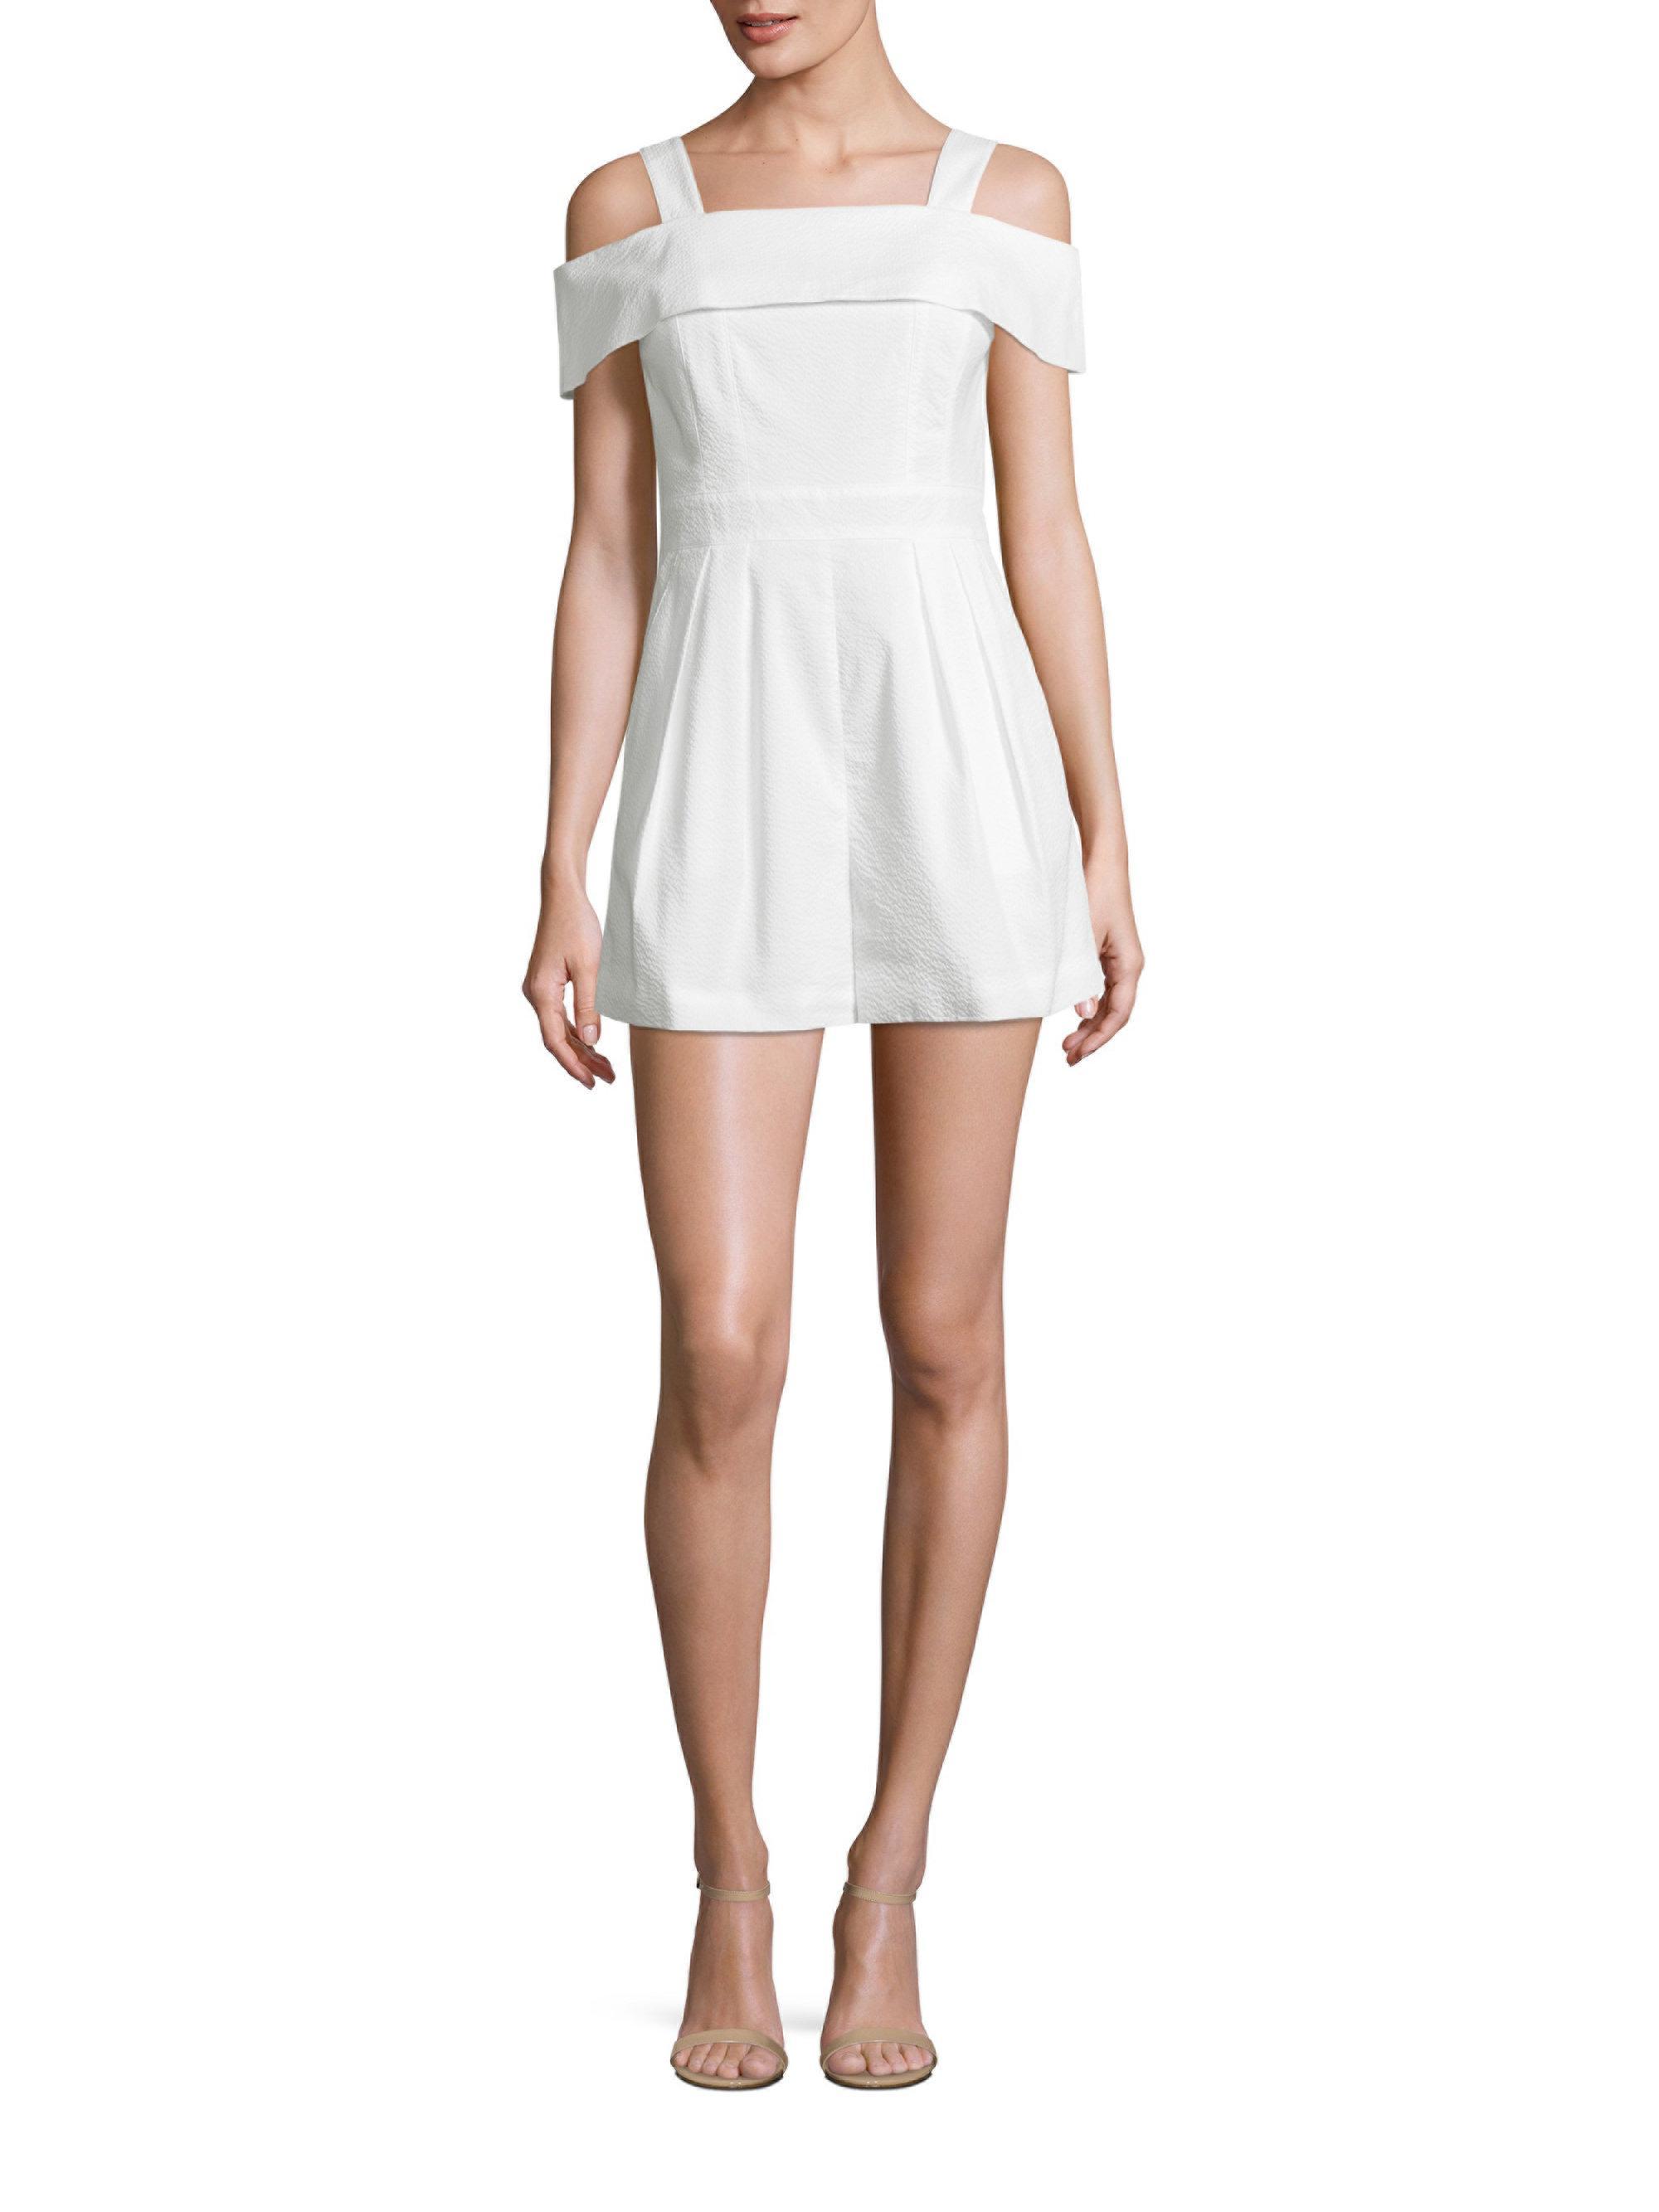 90faf2681d53 Lyst - Tibi Seersucker Jumpsuit in White